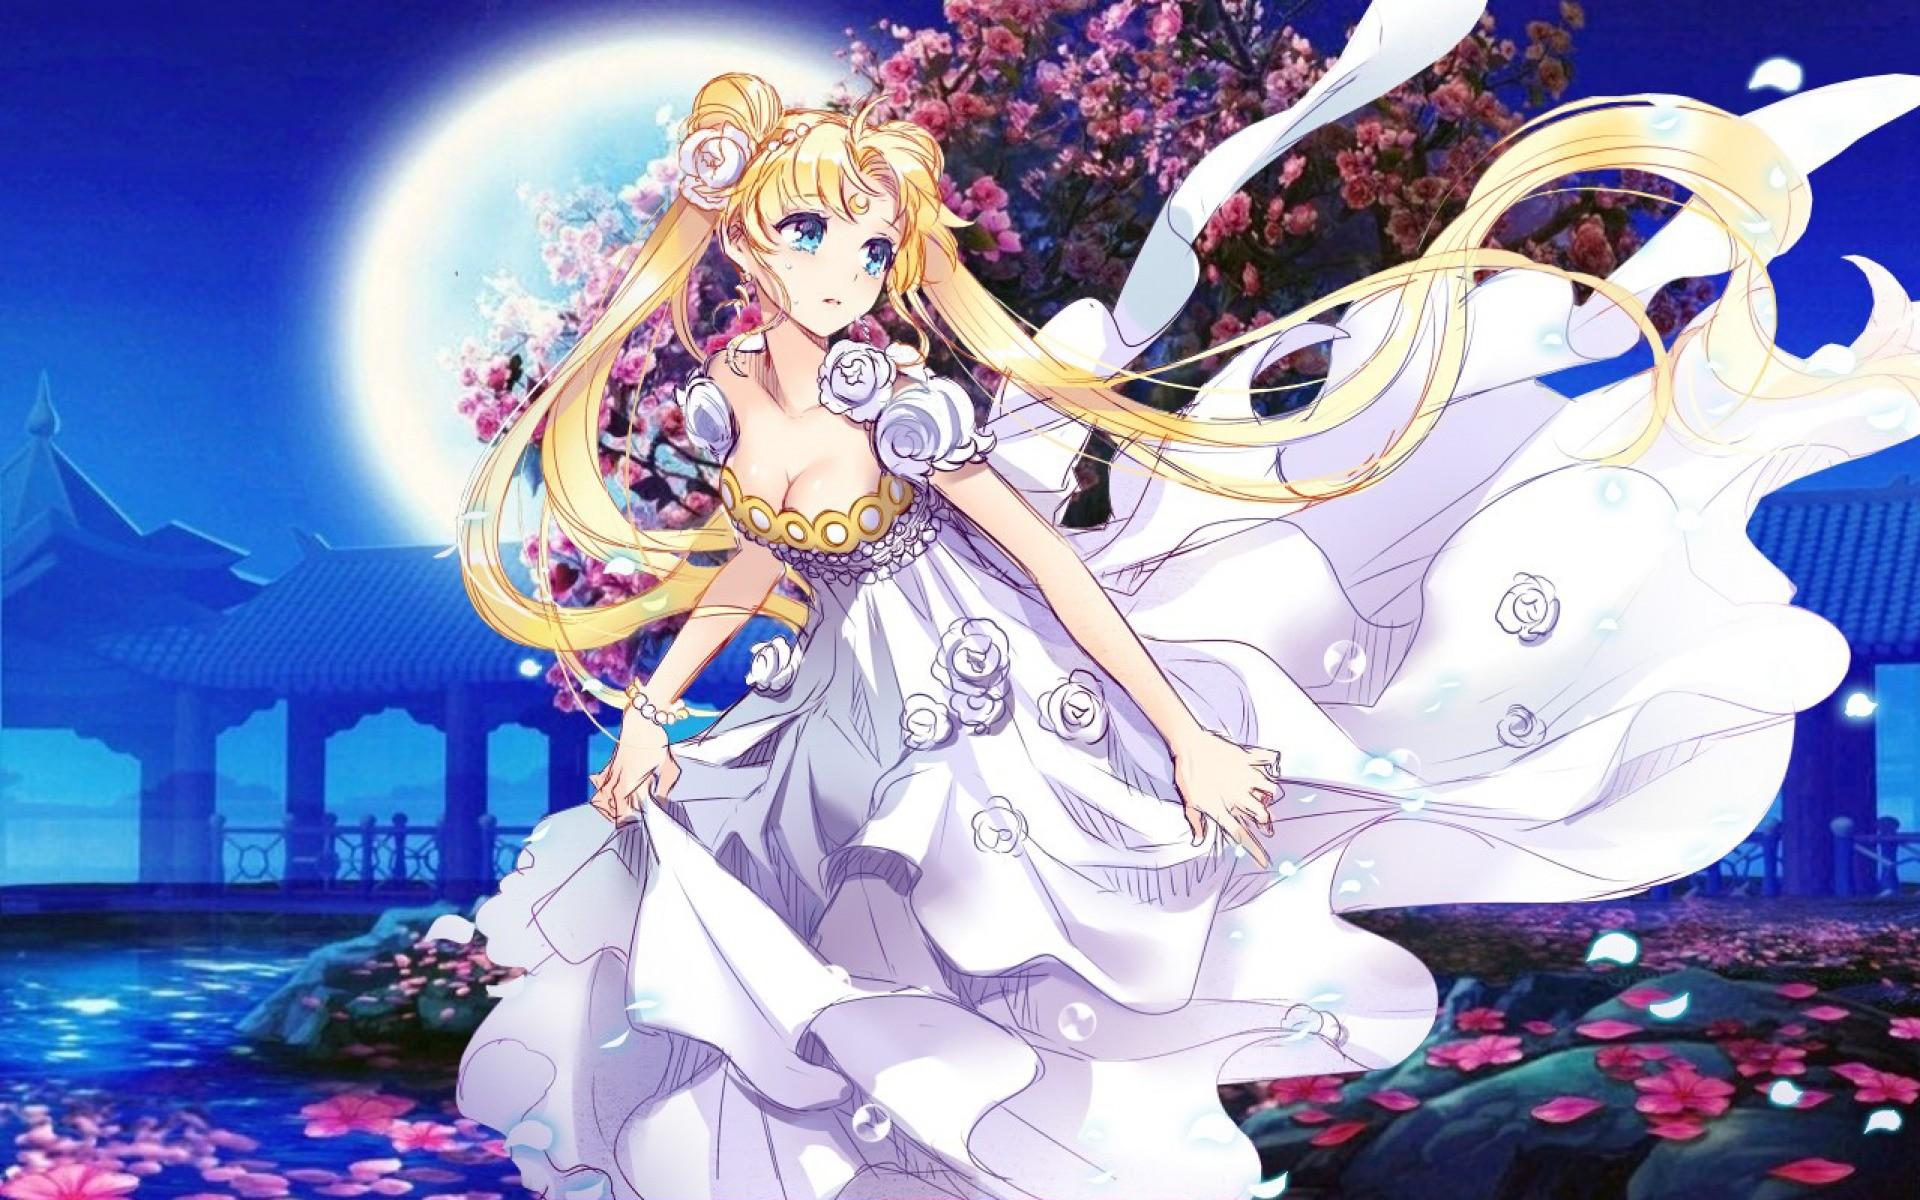 Sailor Moon Wallpaper – Wallpaper, High Definition, High Quality .